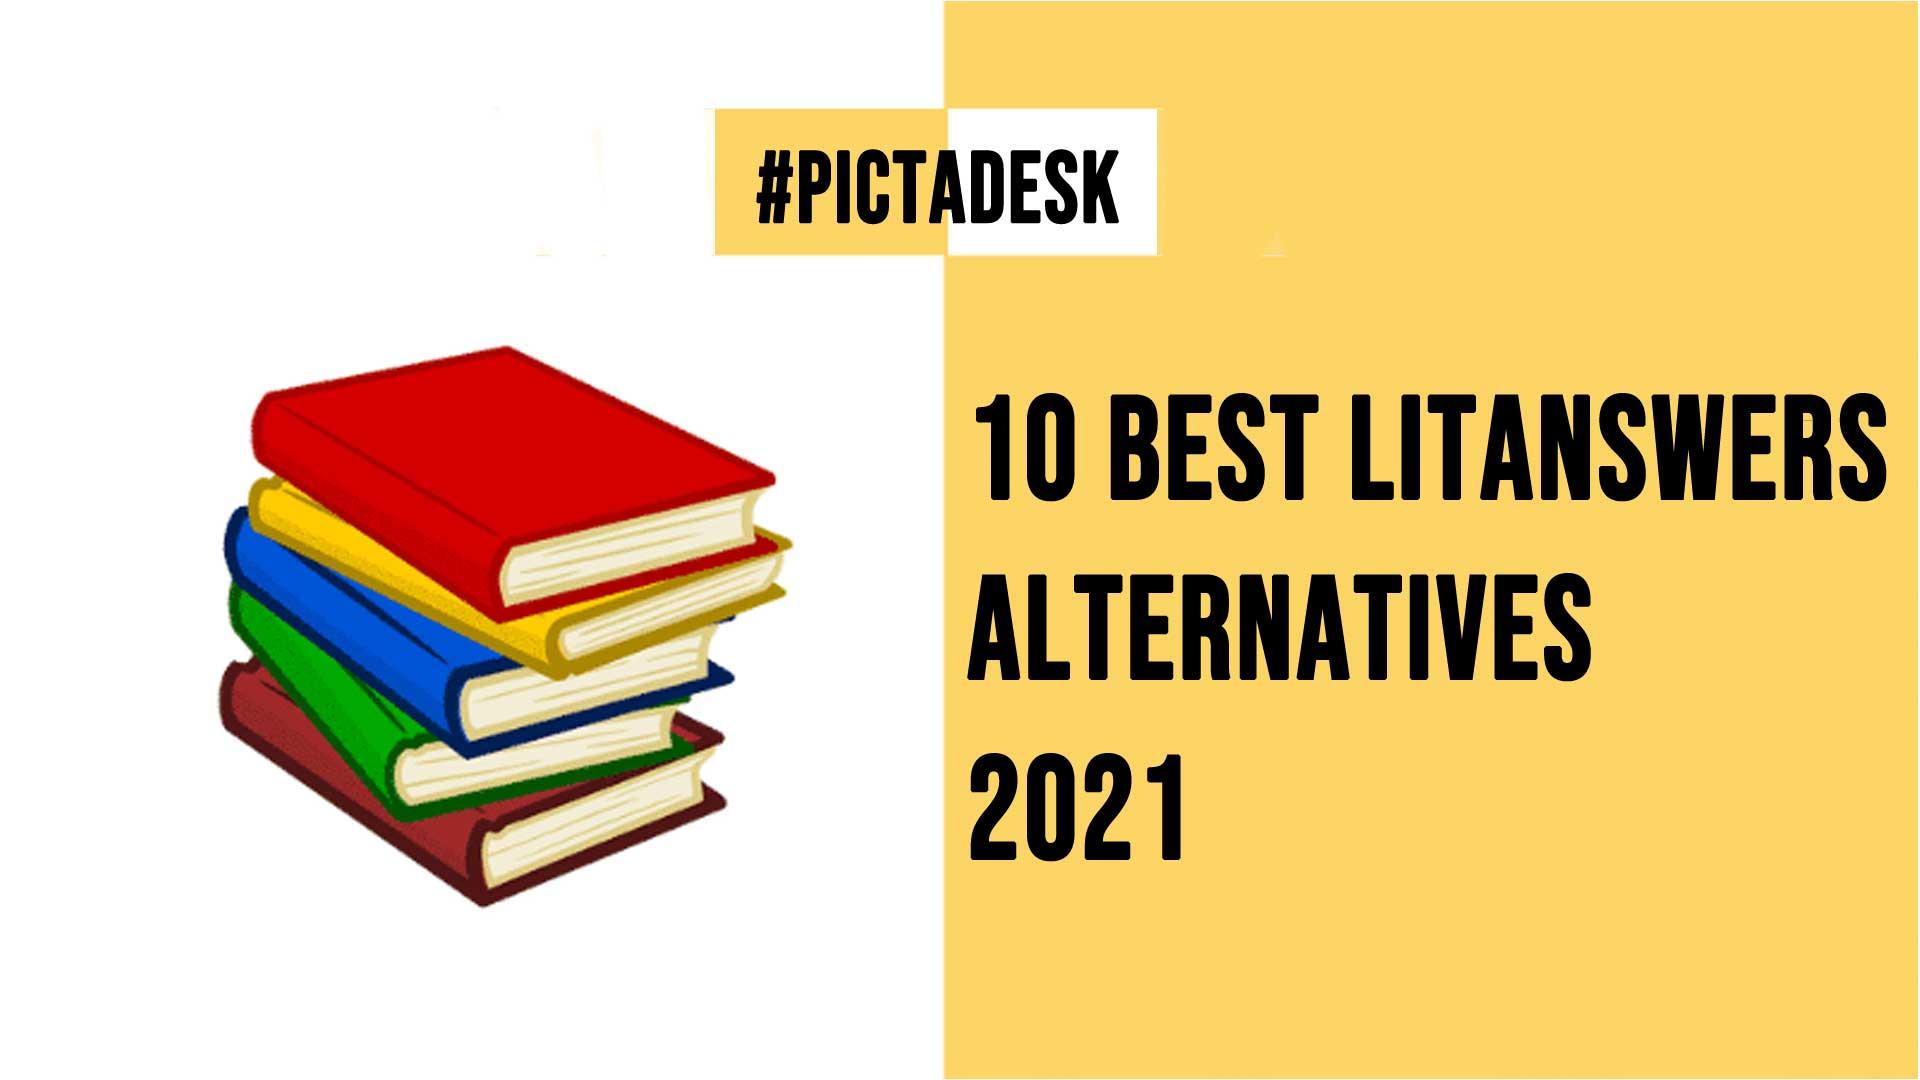 10 Best Litanswers Alternatives 2021